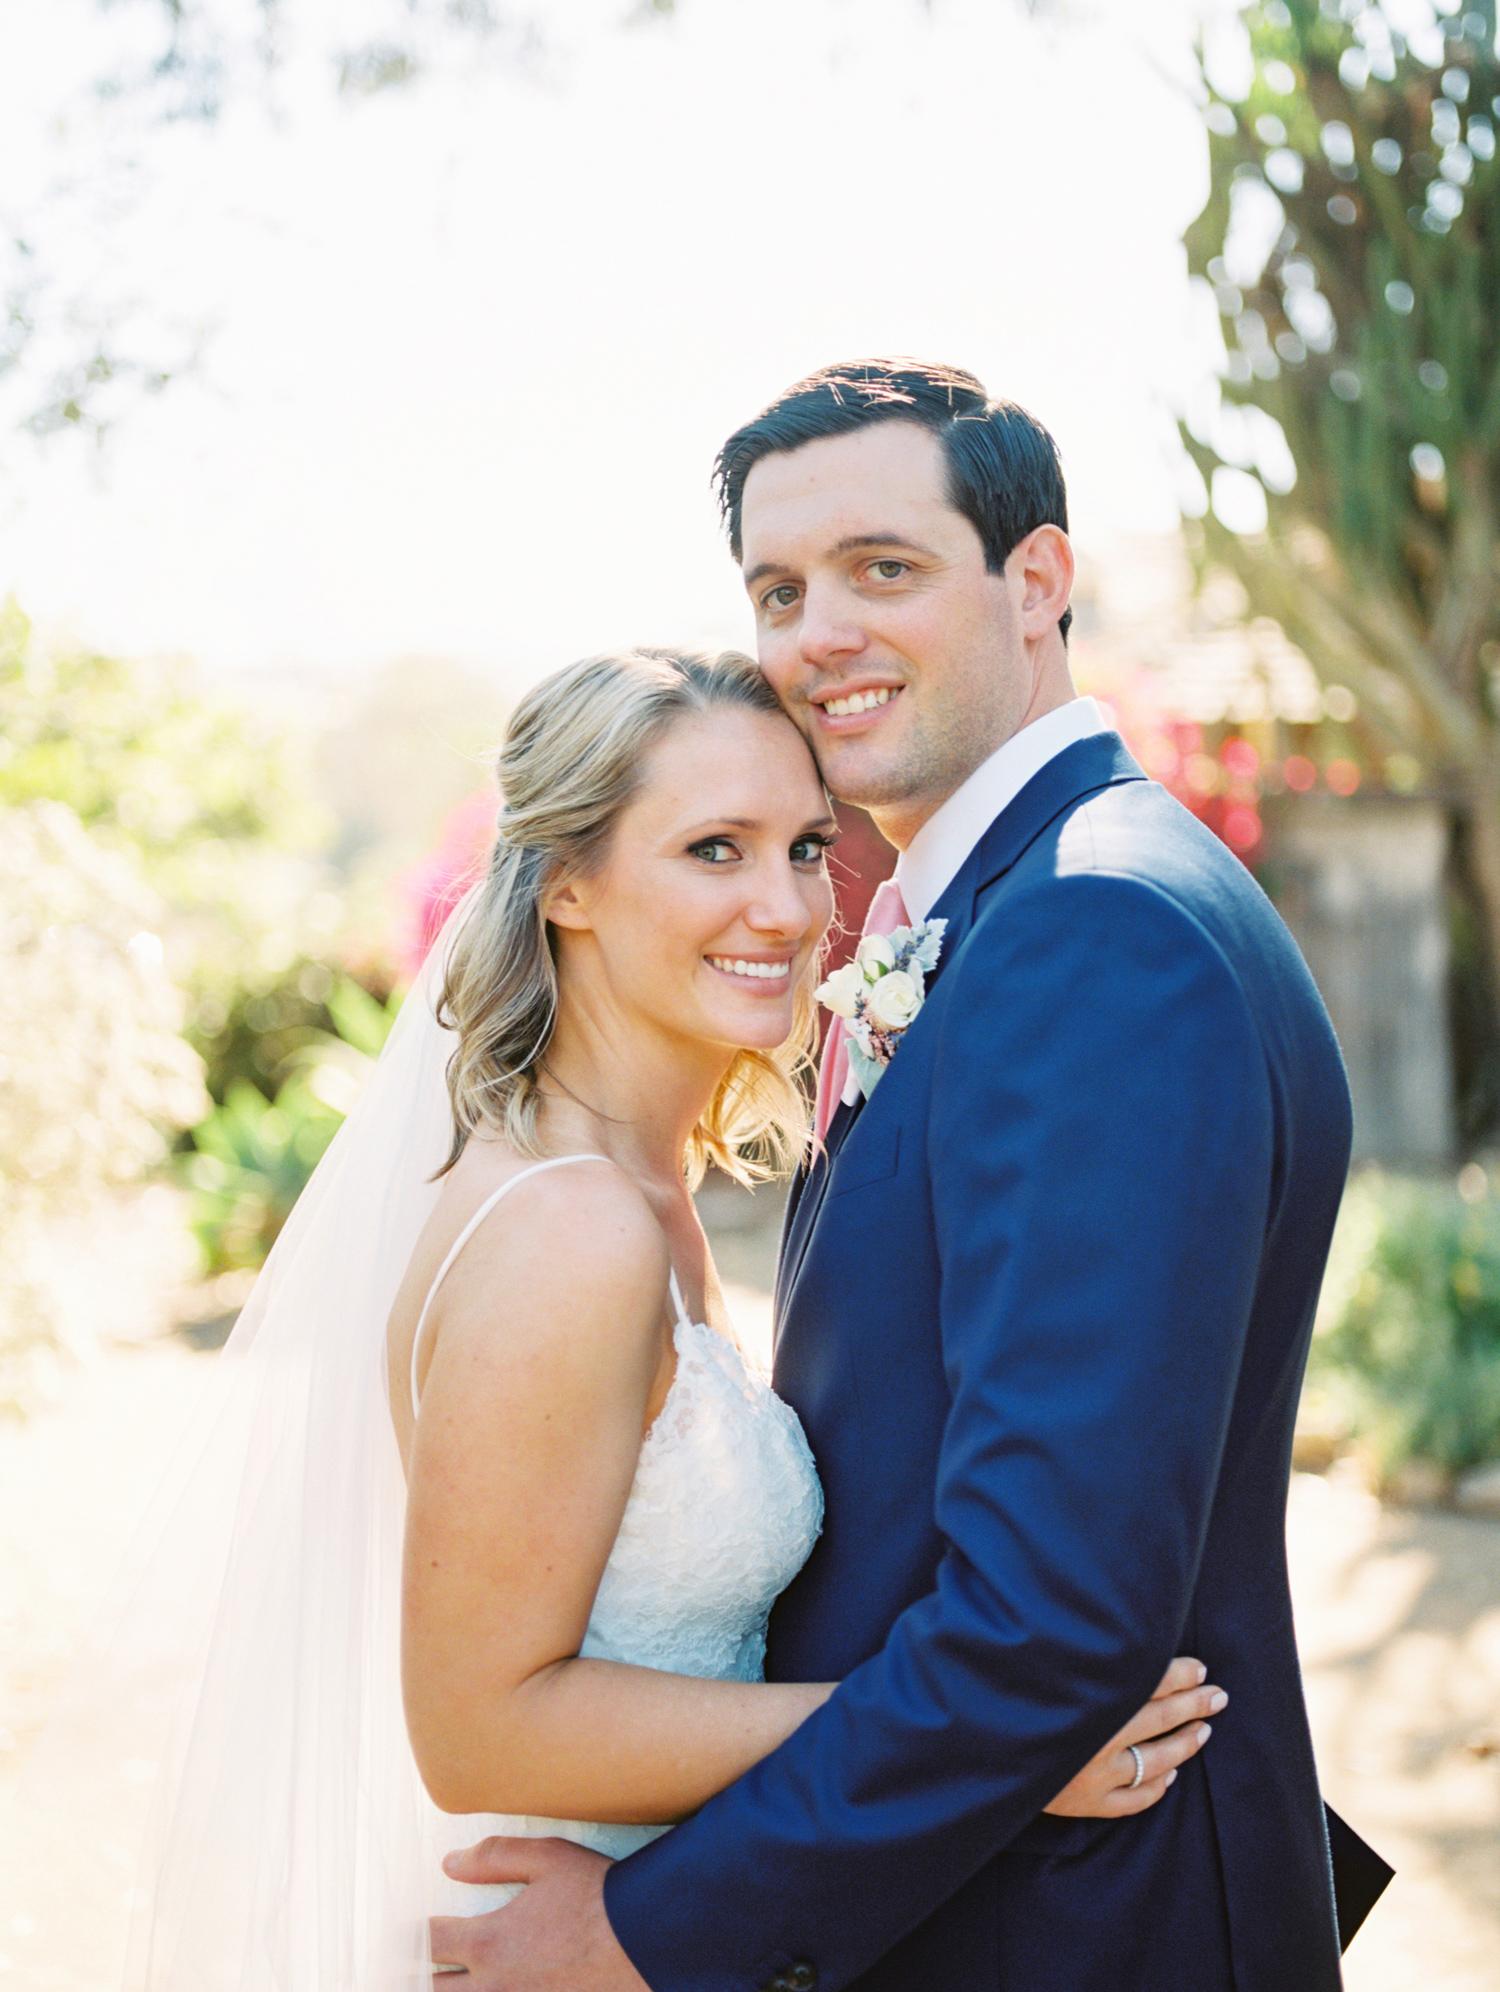 065-Jen-Wojcik-Photography-San-Diego-Wedding-Photographer.jpg